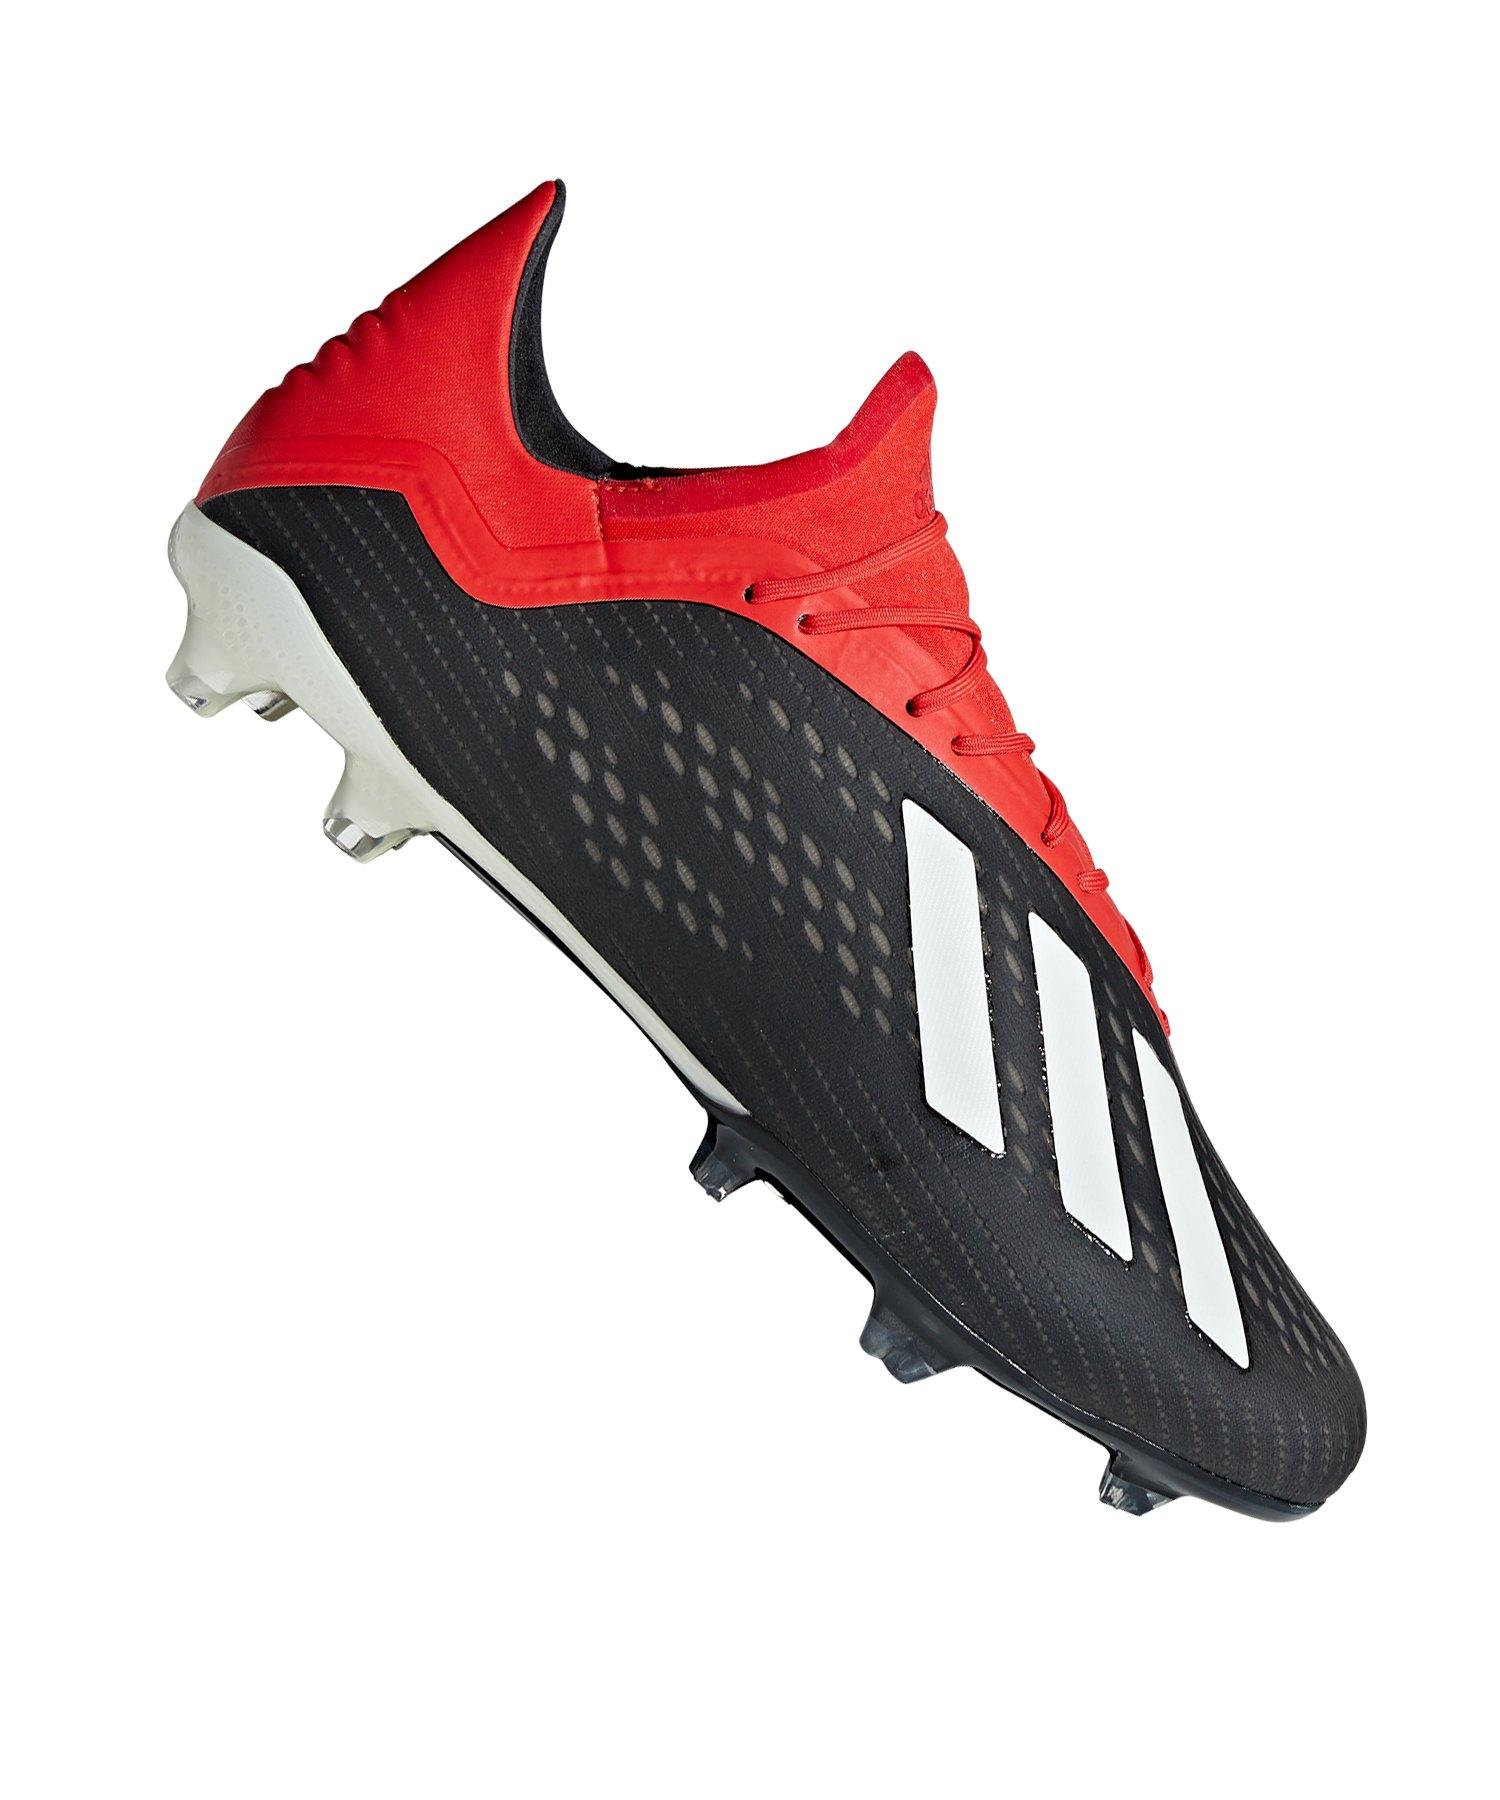 Gold Schwarz Rot Fußballschuhe Adidas Performance | X